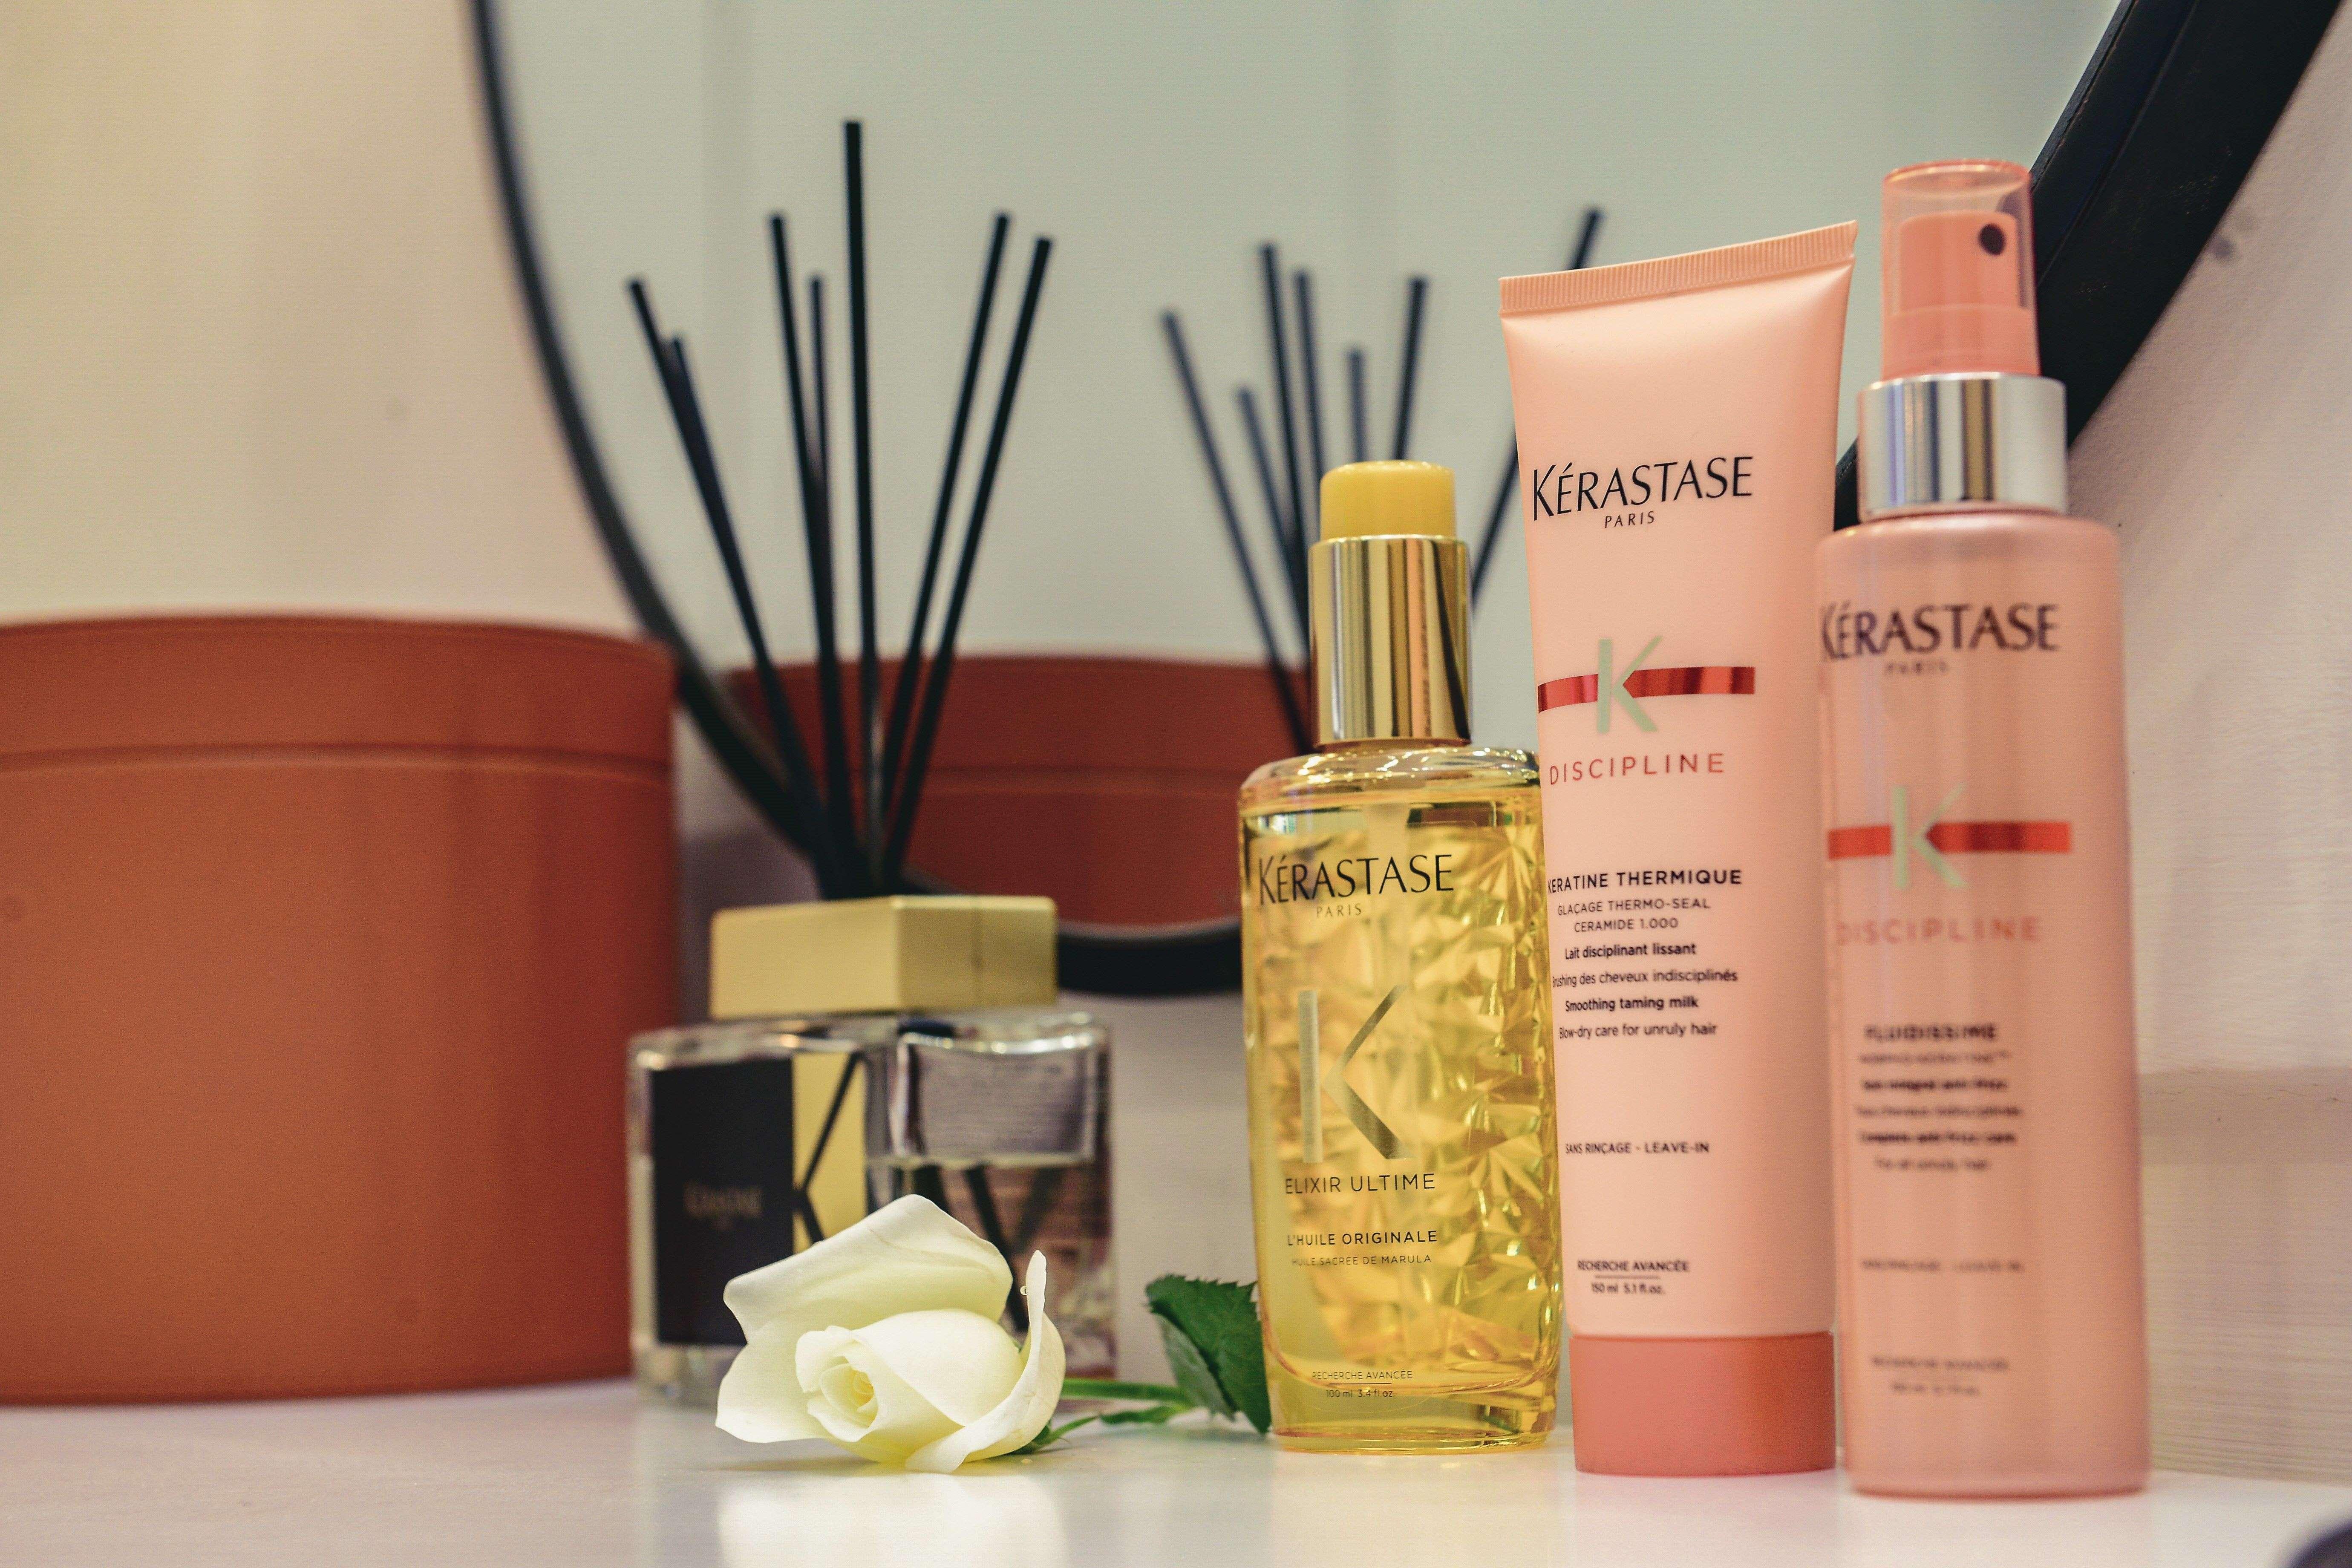 kerastase tinh chất dưỡng tóc đầu tiên elixir original oil